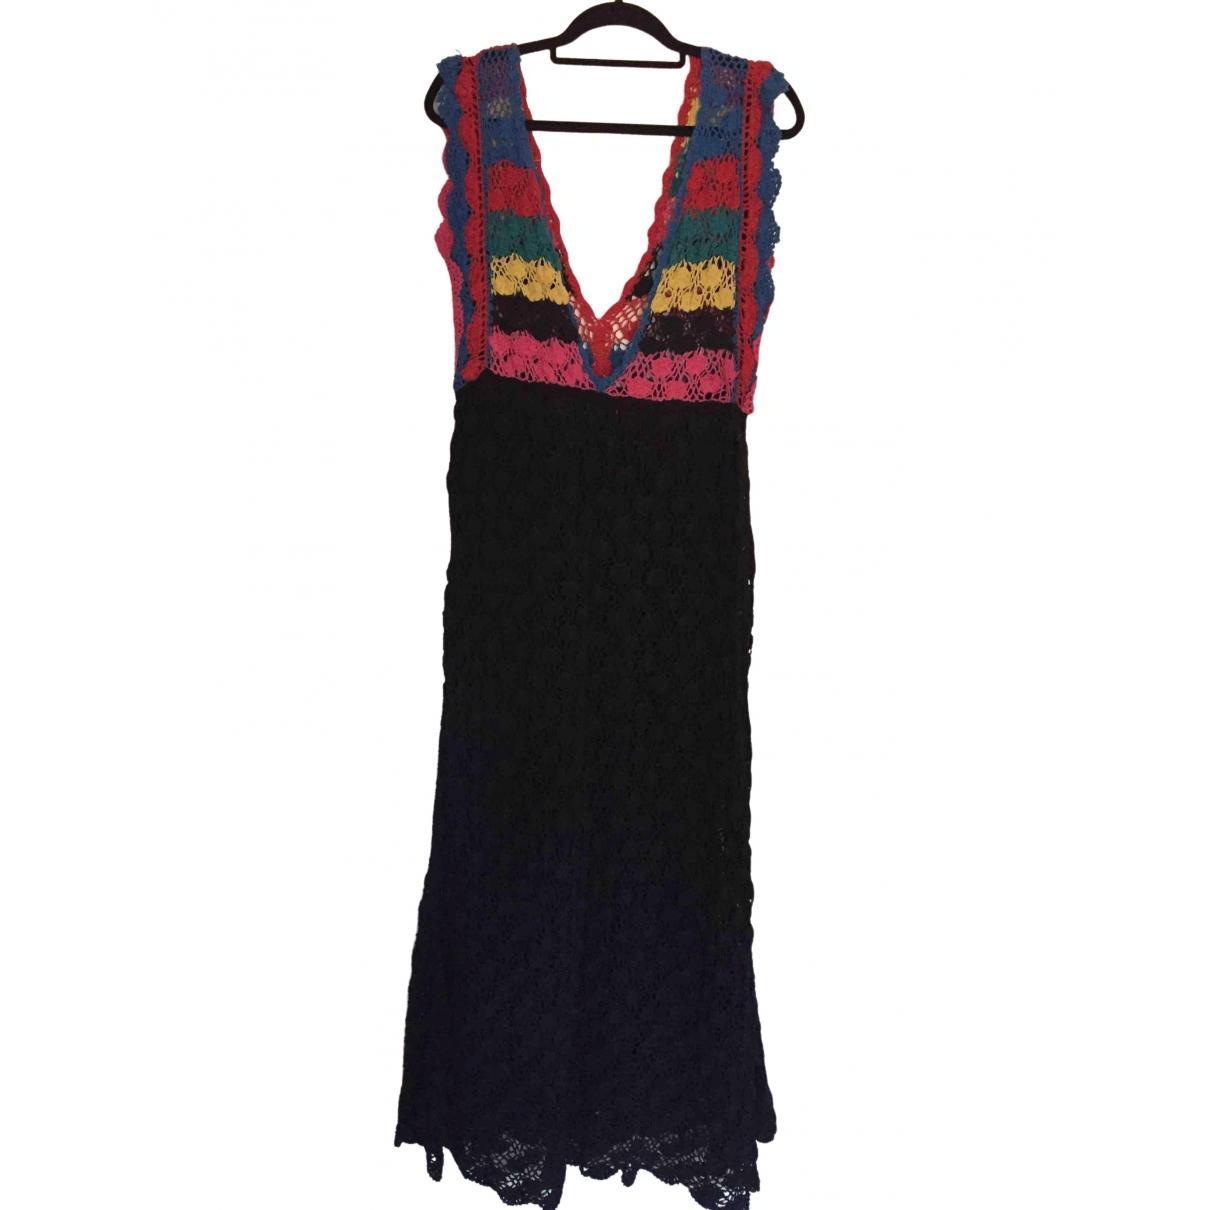 Zara \N Black Cotton dress for Women M International